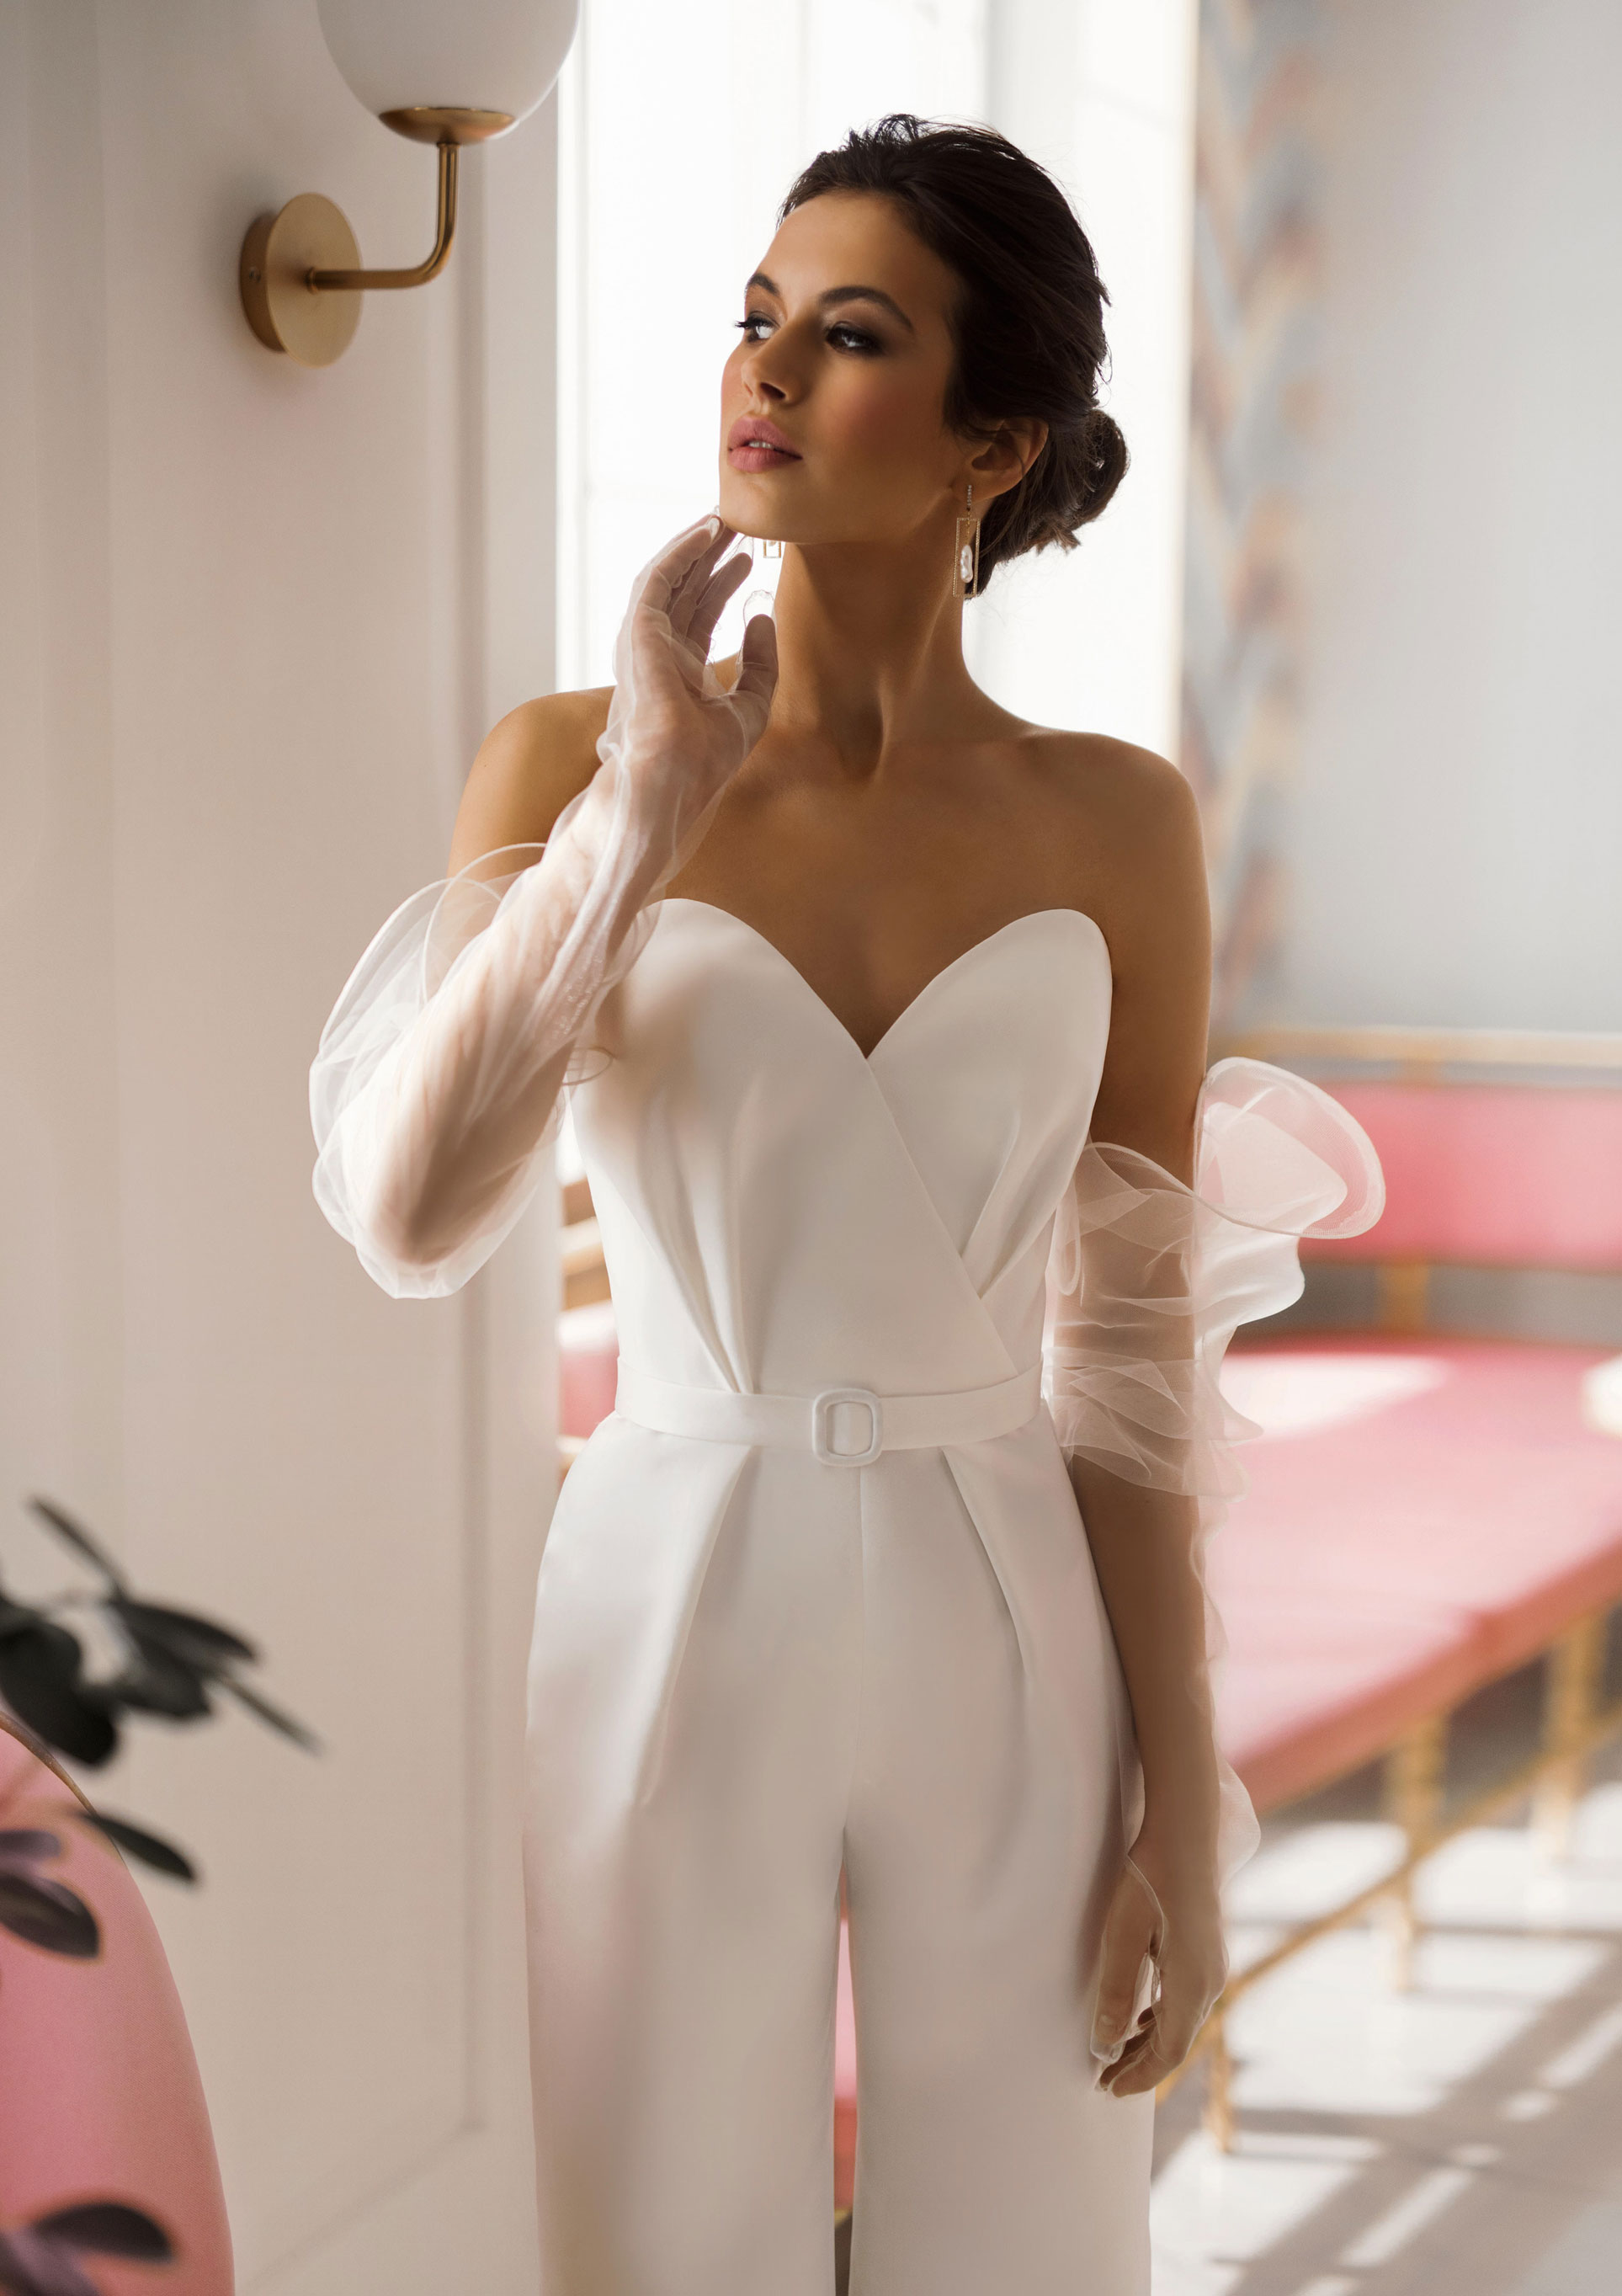 Ксения Саладуха в свадебных нарядах Ave Wedding, весна-лето 2019 / фото 08